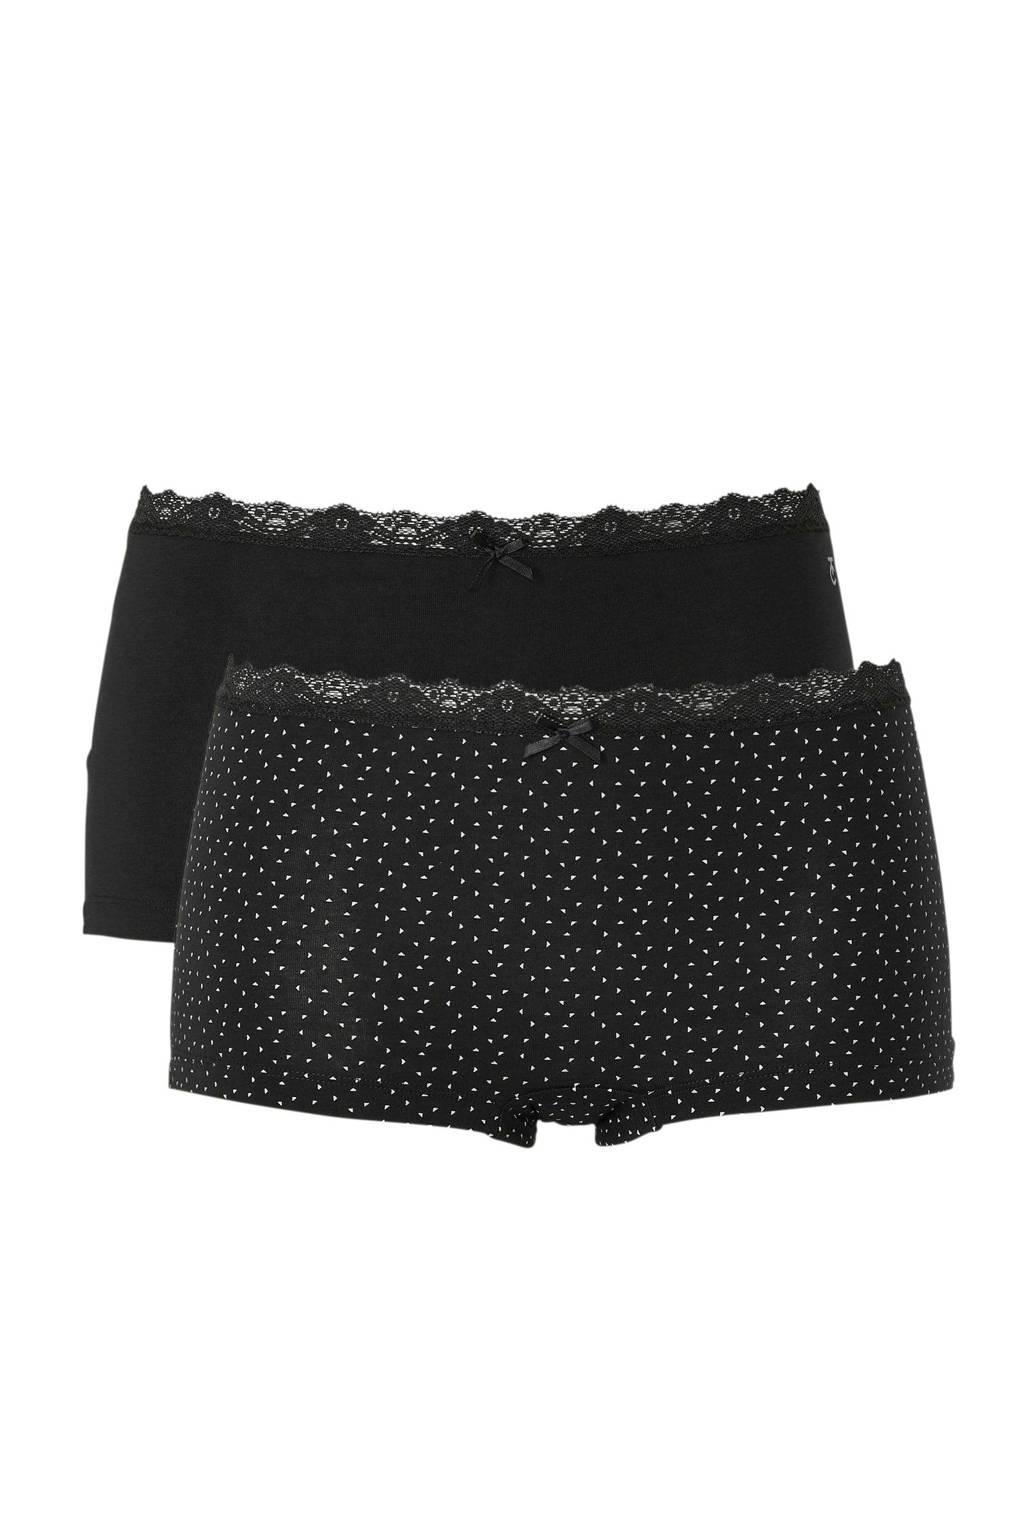 Ten Cate Women short Black 2-pack